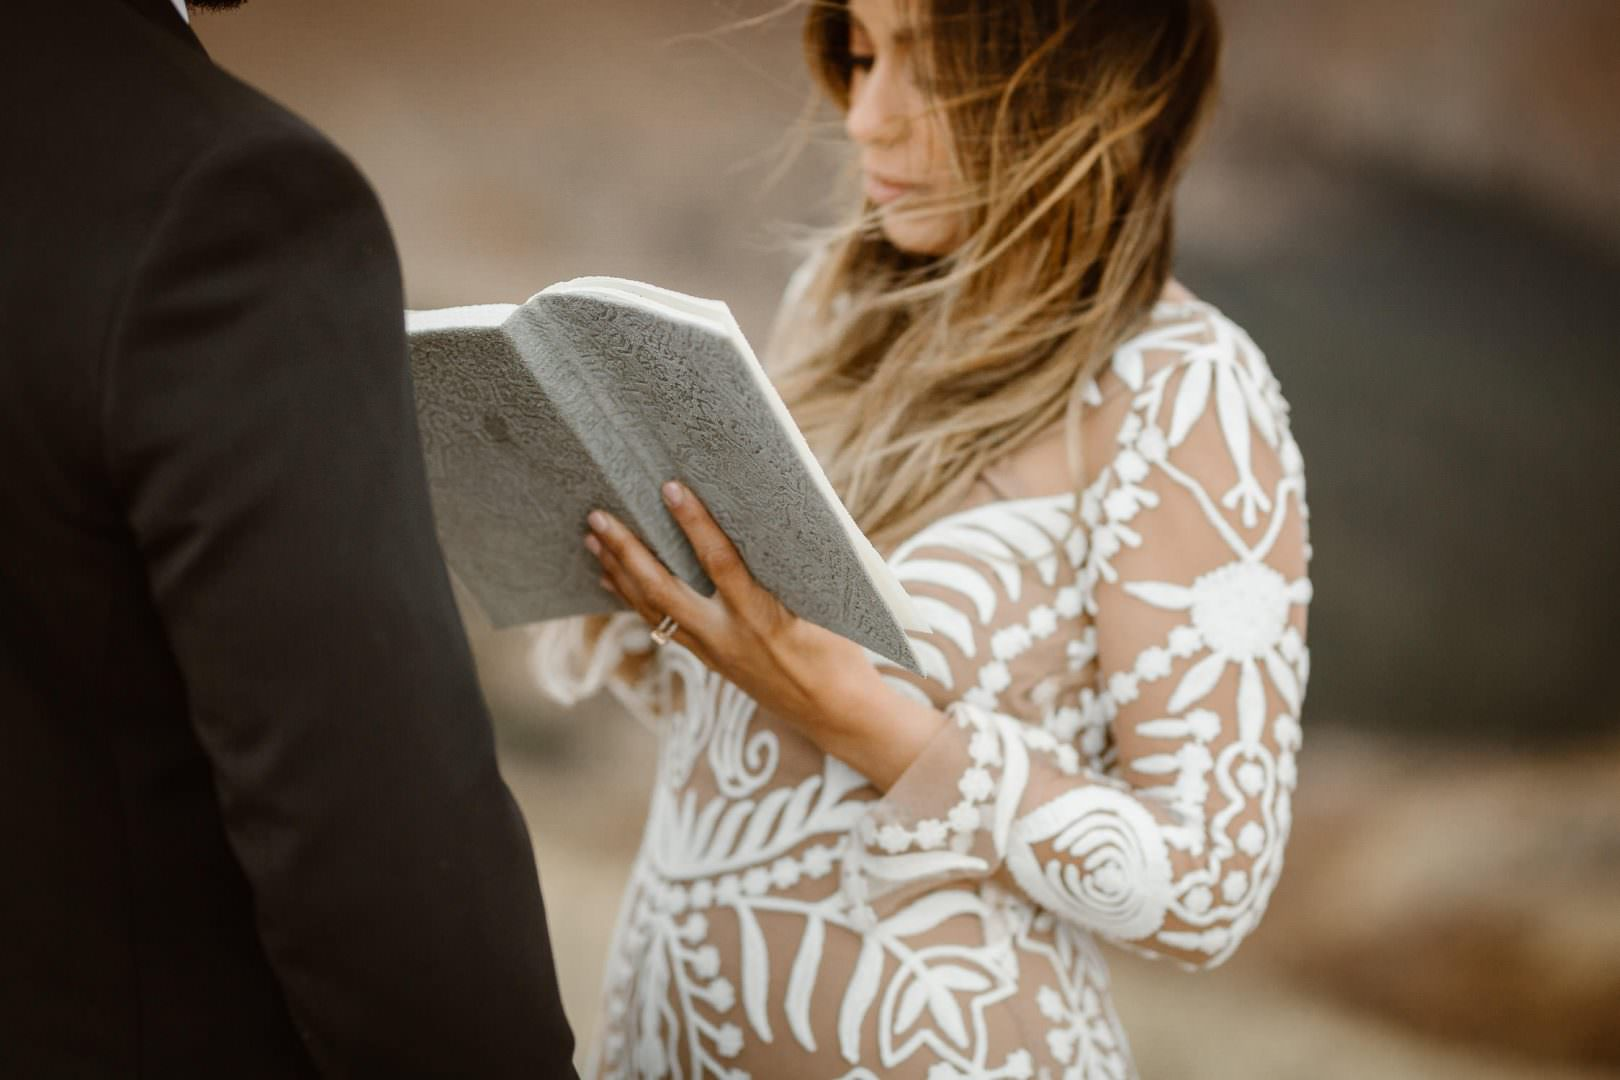 JOHN'S +JANEENA ADVENTUROUS BRECKENRIDGE ELOPEMENT | SUNRISE FIRST LOOK AT LOVELAND PASS | SUNRISE WEDDING CEREMONY AT LOVELAND PASS | DESTINATION ELOPEMENT PHOTOGRAPHERCOLORADO ADVENTURE PHOTOGRAPHY|COLORADO ELOPEMENT PHOTOGRAPHER|DESTINATION ADVENTURE ELOPEMENTS + INTIMATE WEDDINGS FOR MADLY IN LOVE SOULS| ROCKY MOUNTAIN NATIONAL PARK COLORADO ELOPEMENT PHOTOGRAPHER